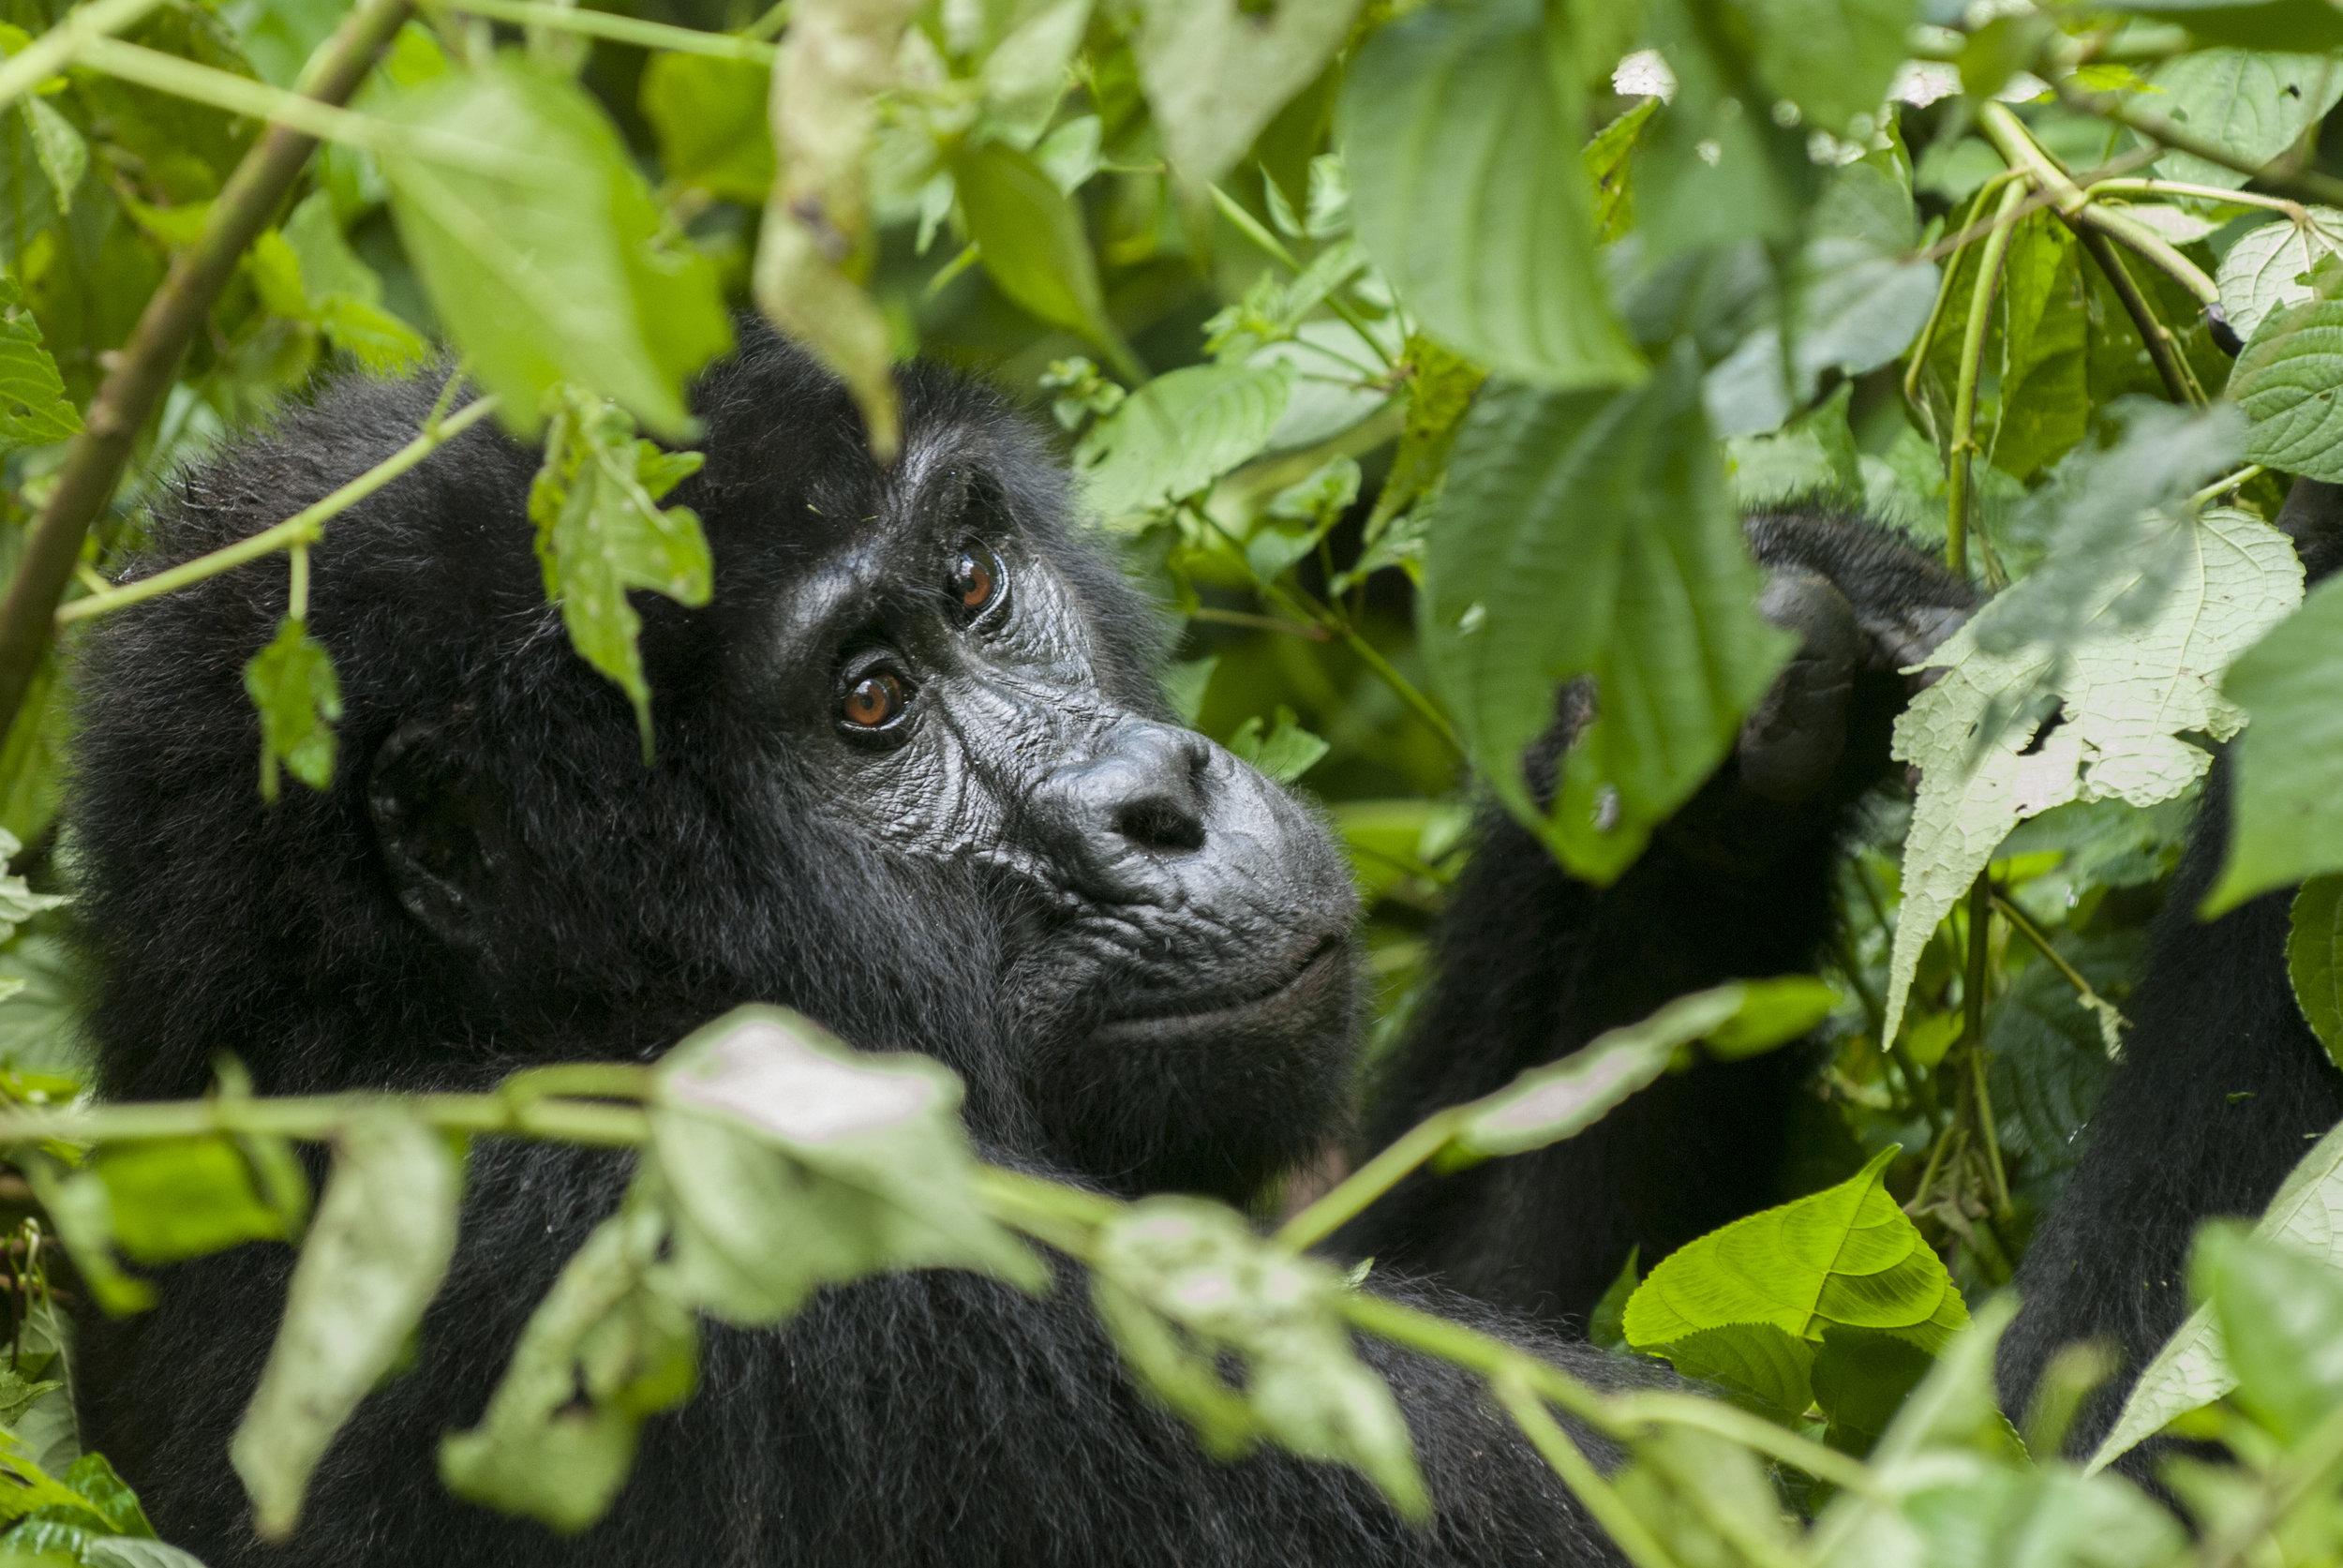 Gorillas in Bwindi National Park, in southwest Uganda. ©Levi S. Norton